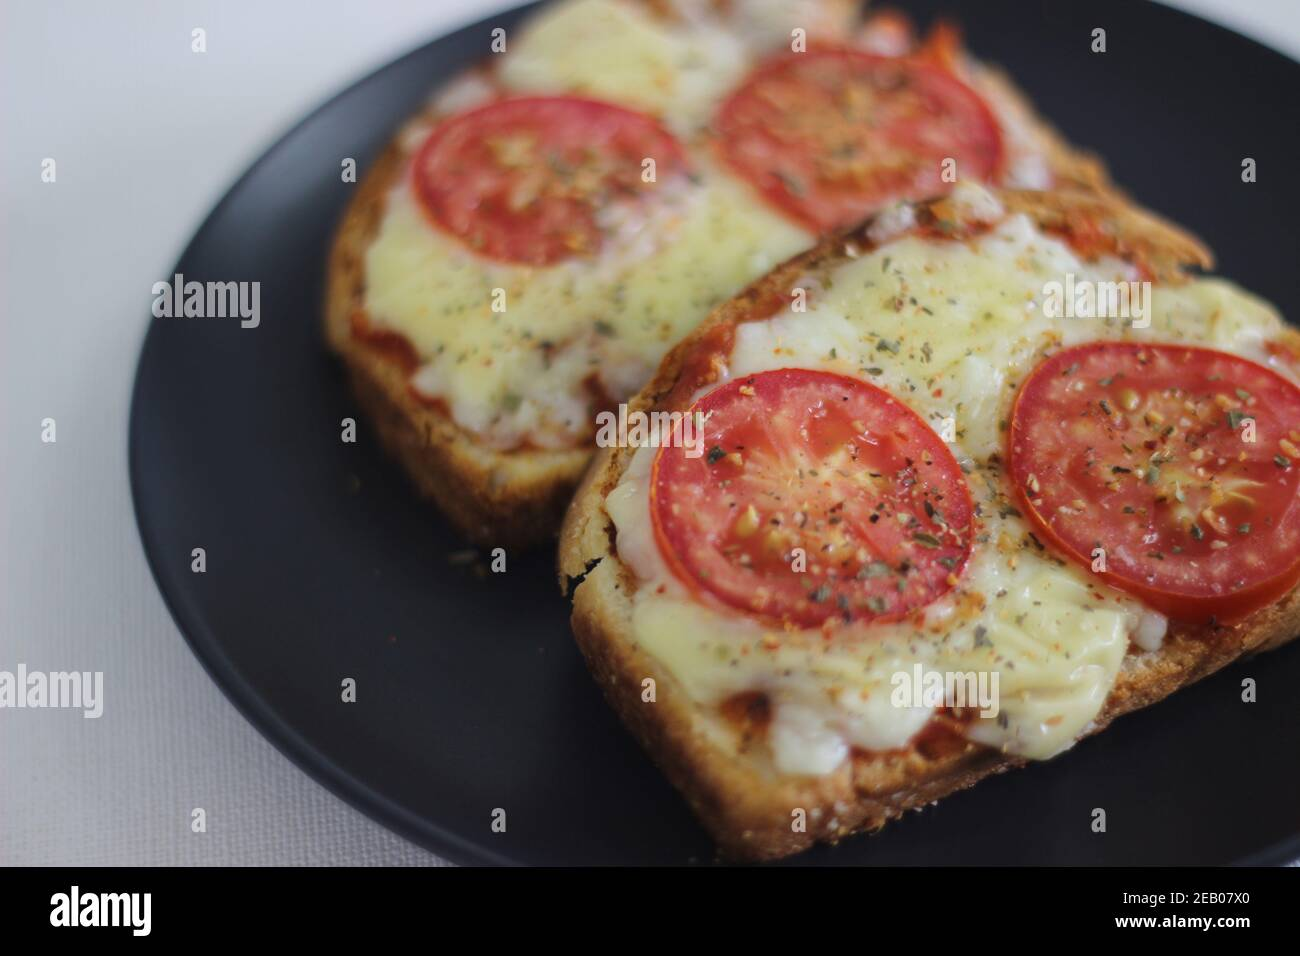 Tostada de pizza con pan casero. Grabado sobre fondo blanco. Foto de stock